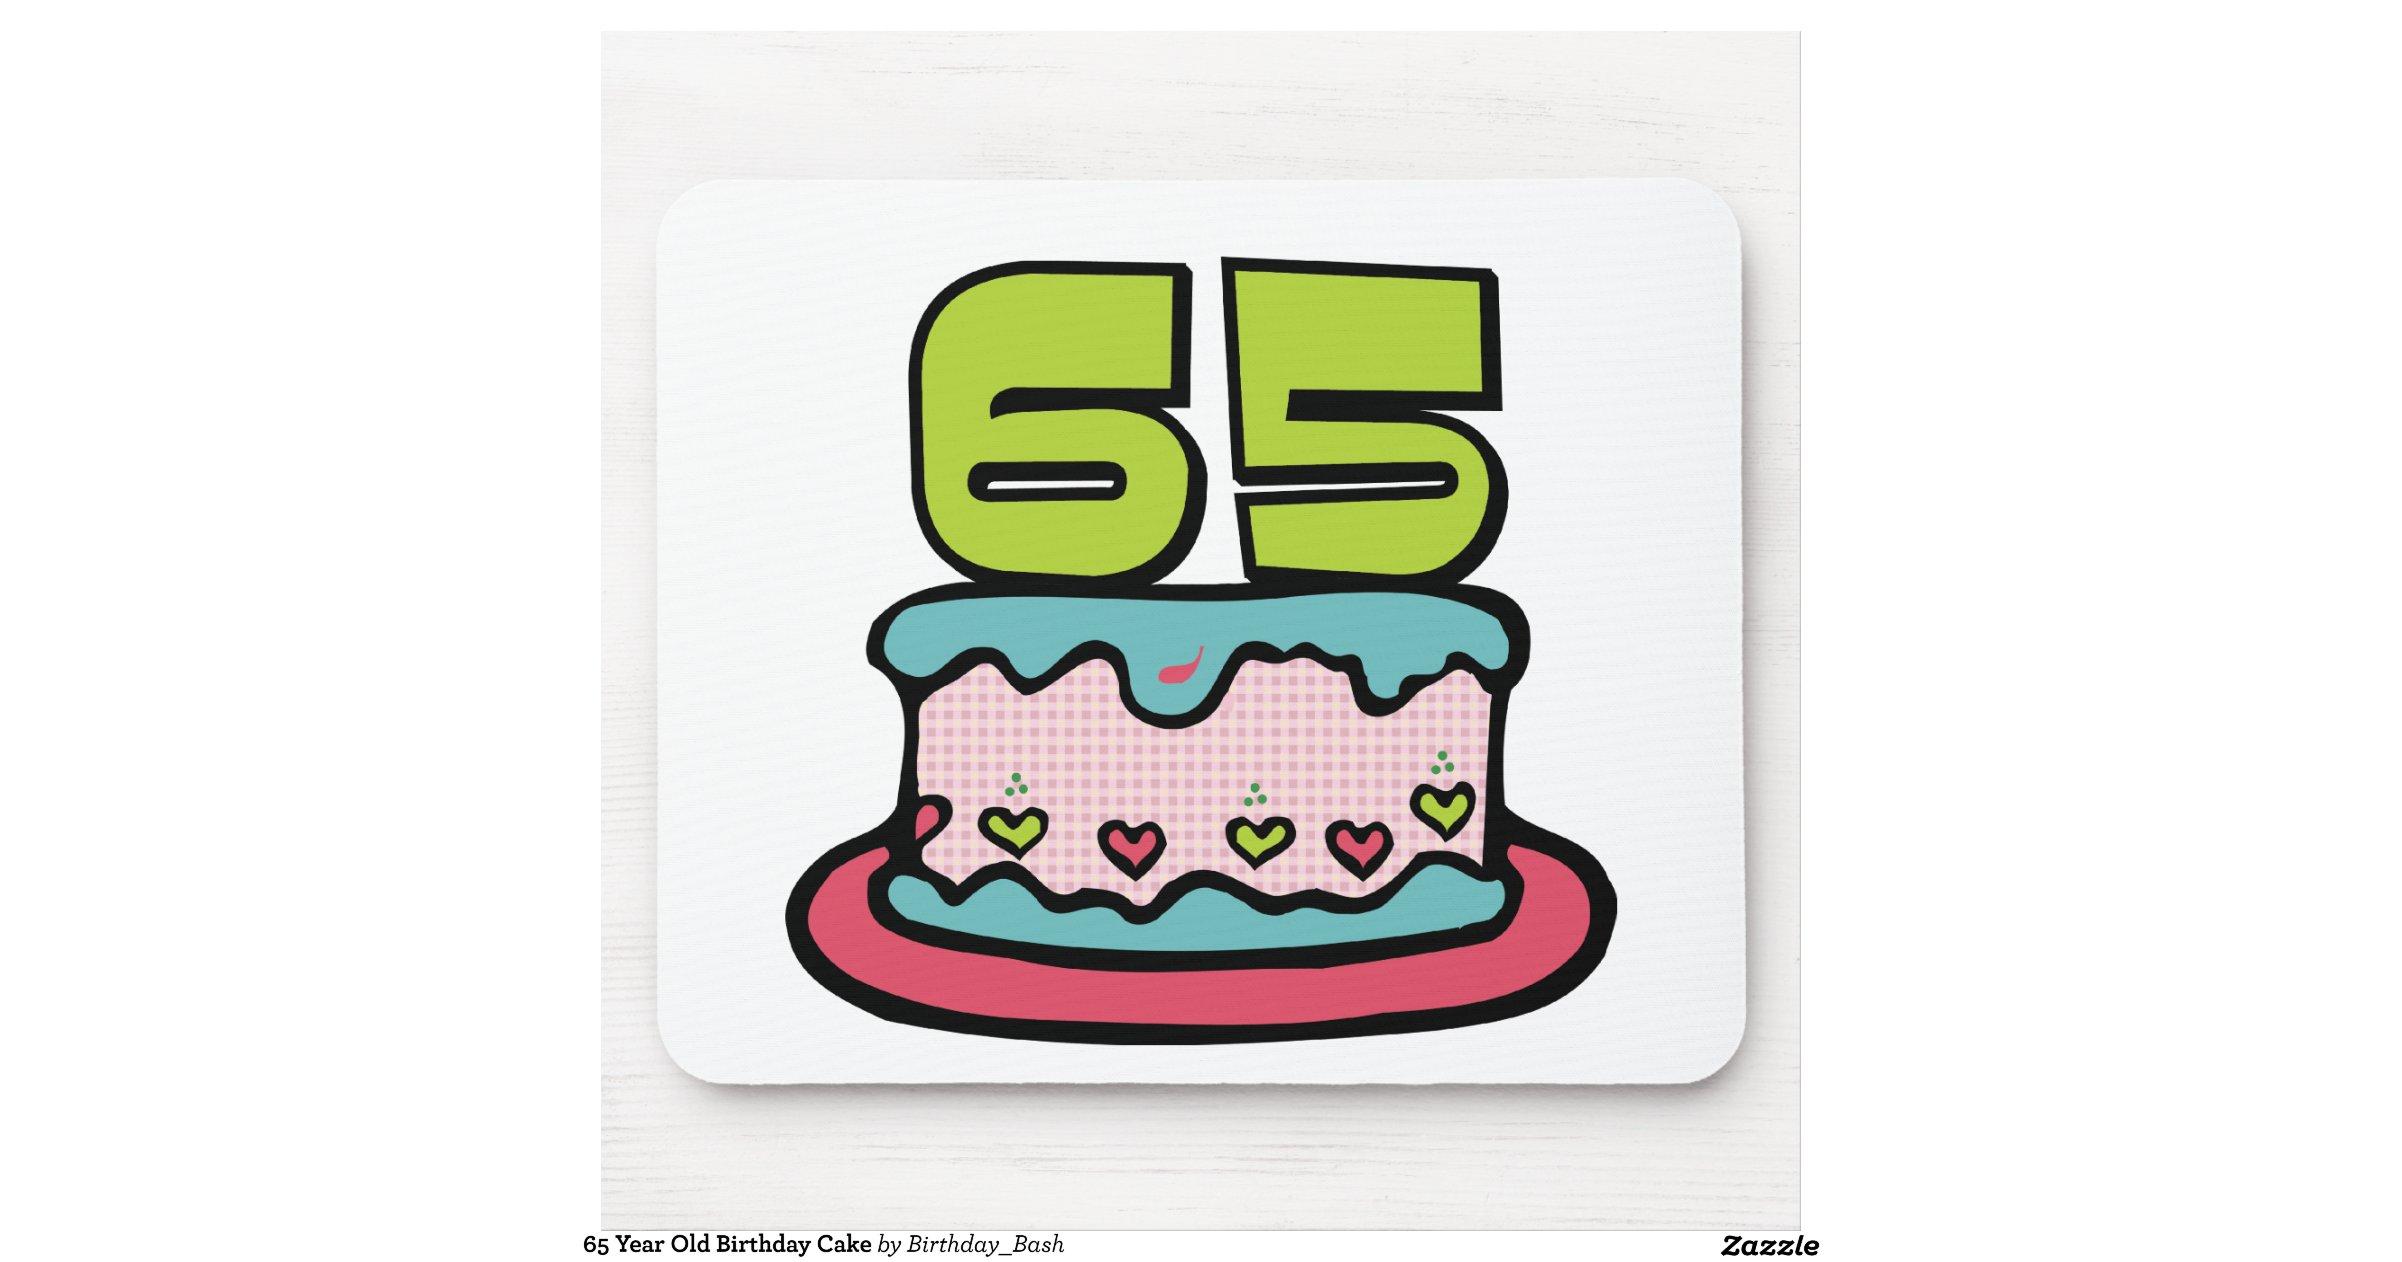 65 year old ms haydee 9